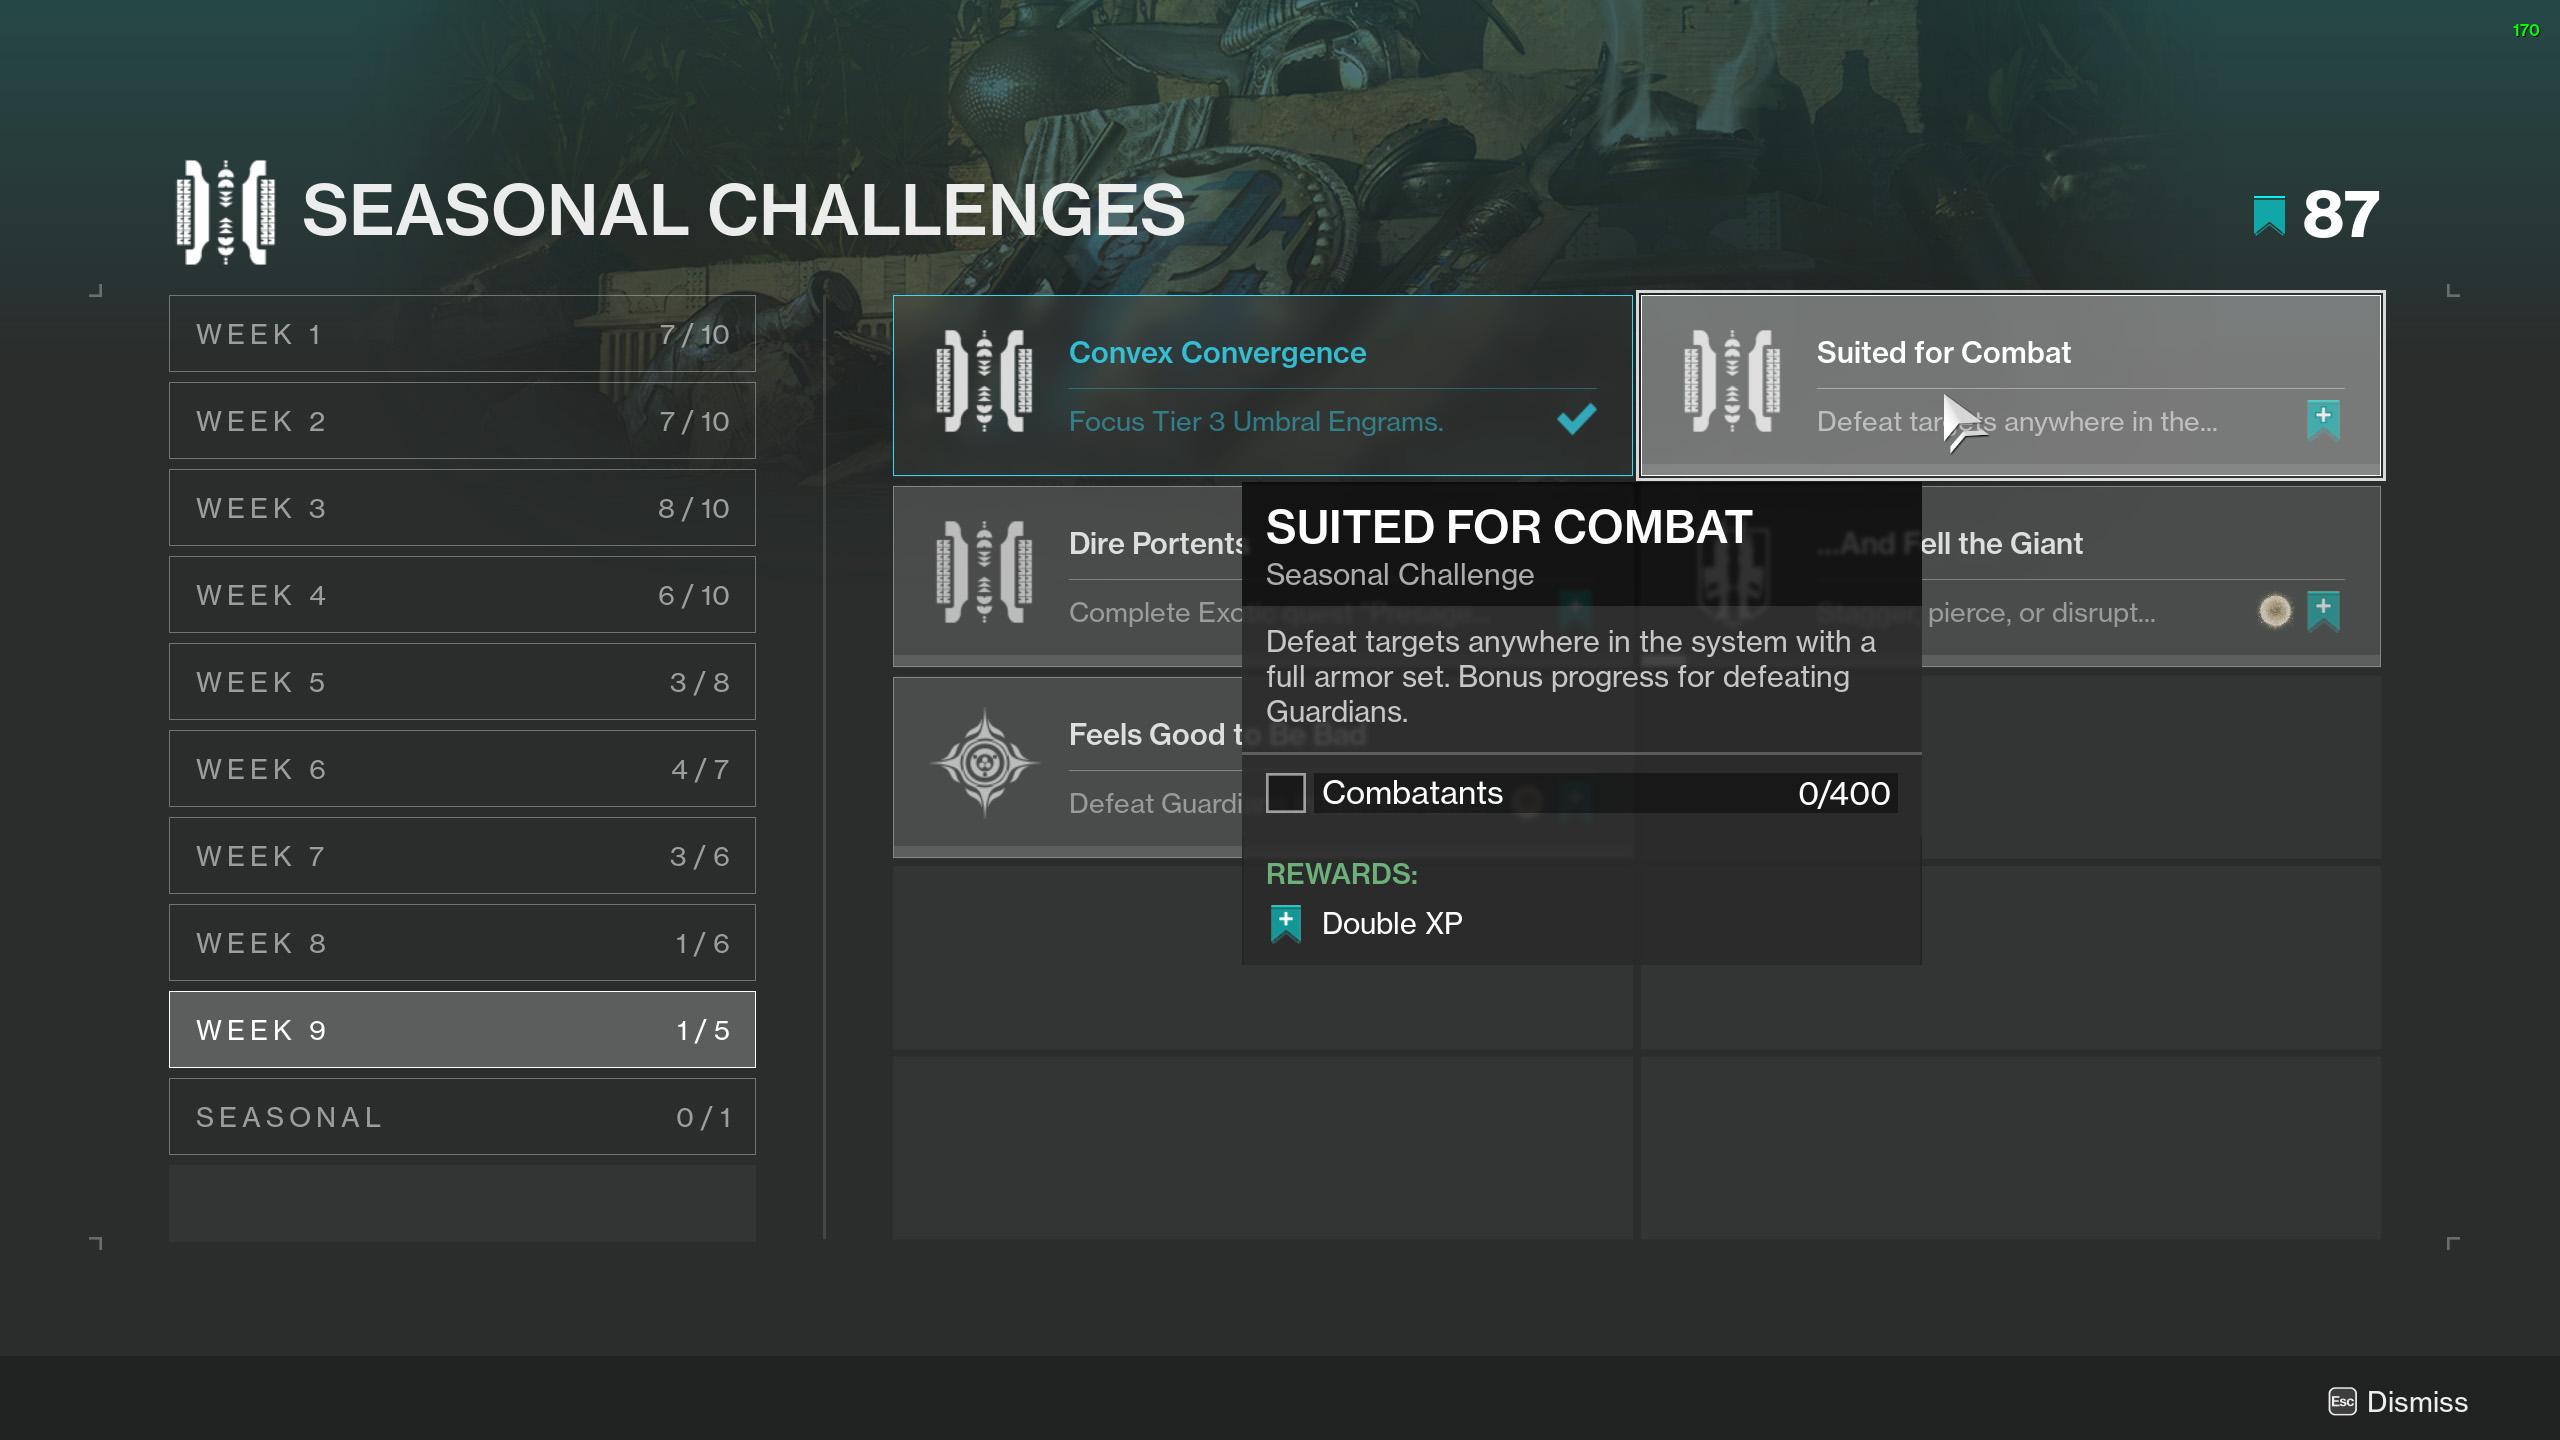 destiny 2 suited for combat